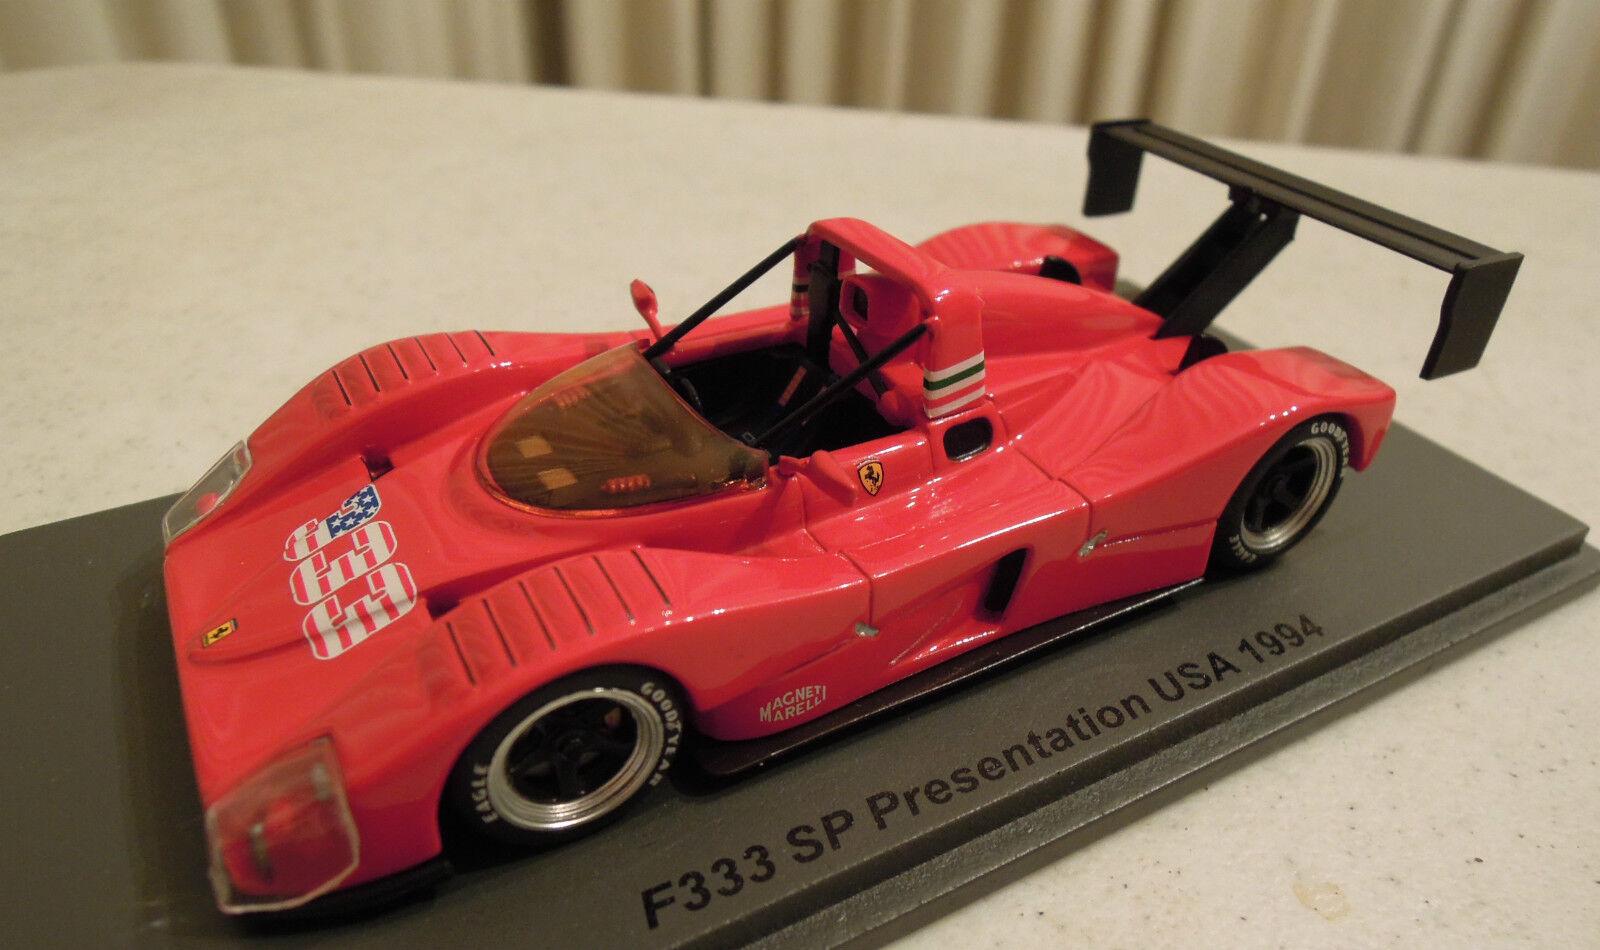 Ferrari 333 Presentation 1994 Spark Model 1 43, New in Box, Ships From USA